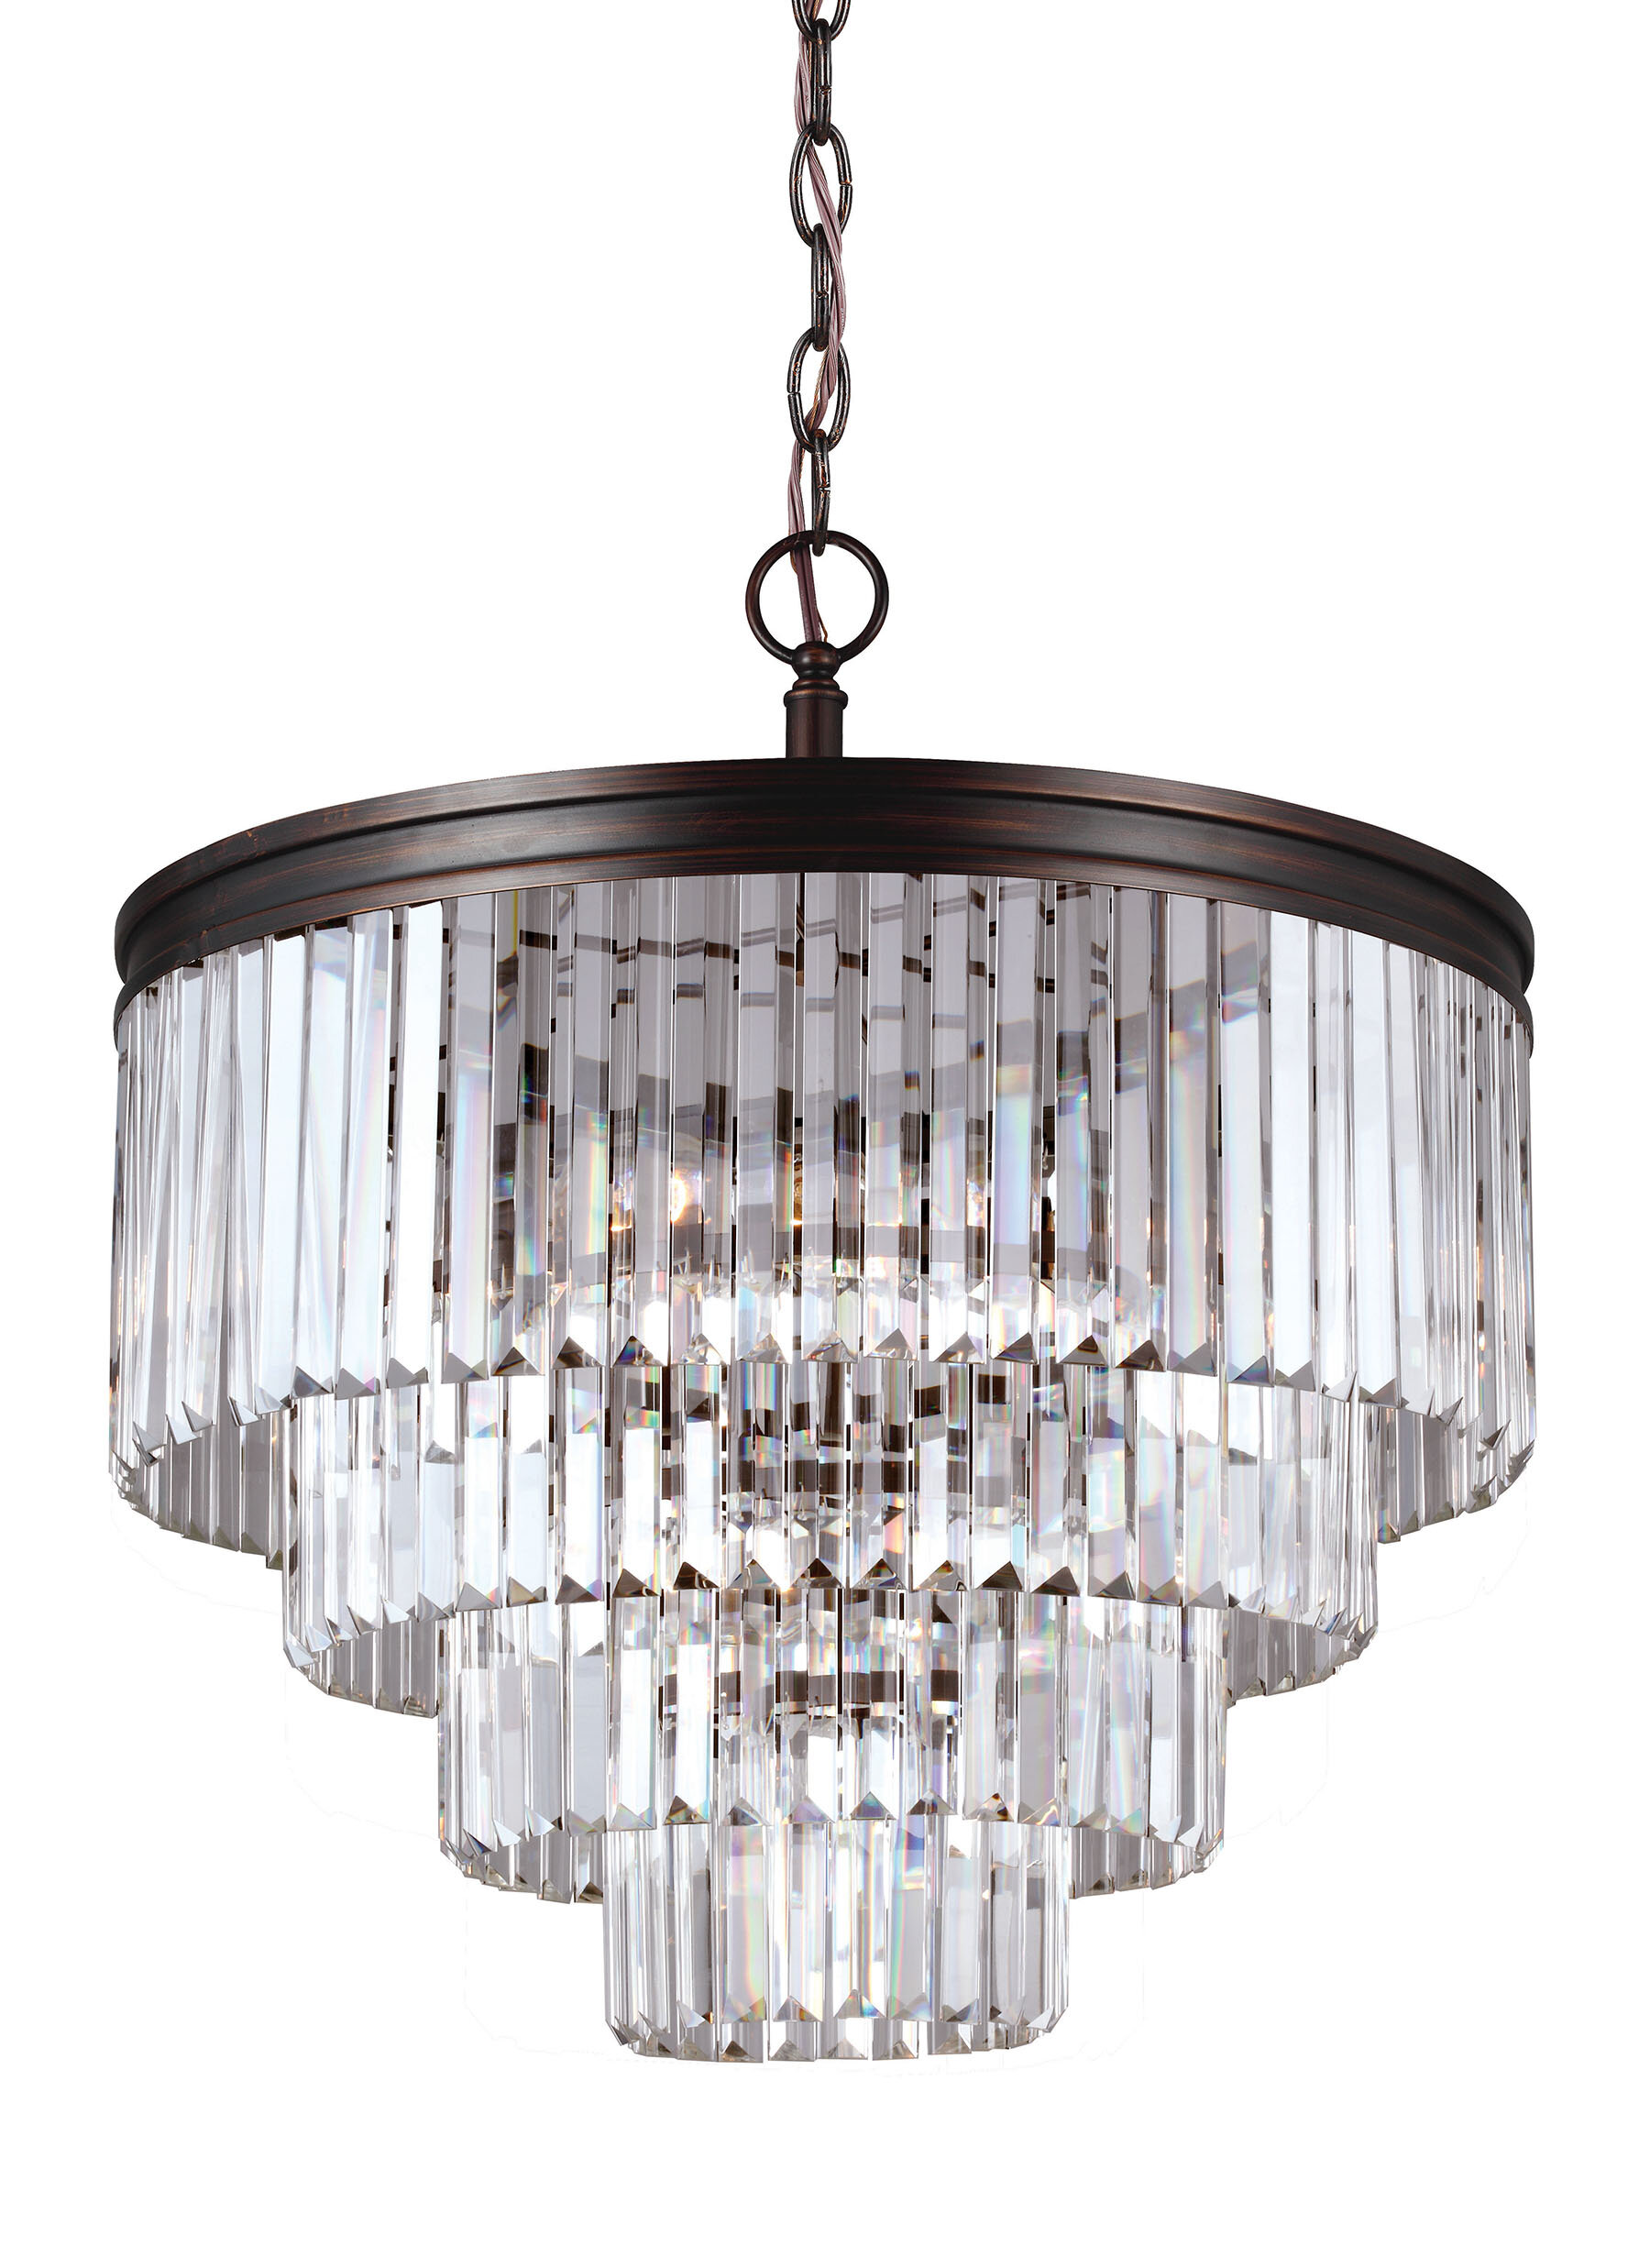 Willa Arlo Interiors Domenique 6 Light Crystal Chandelier